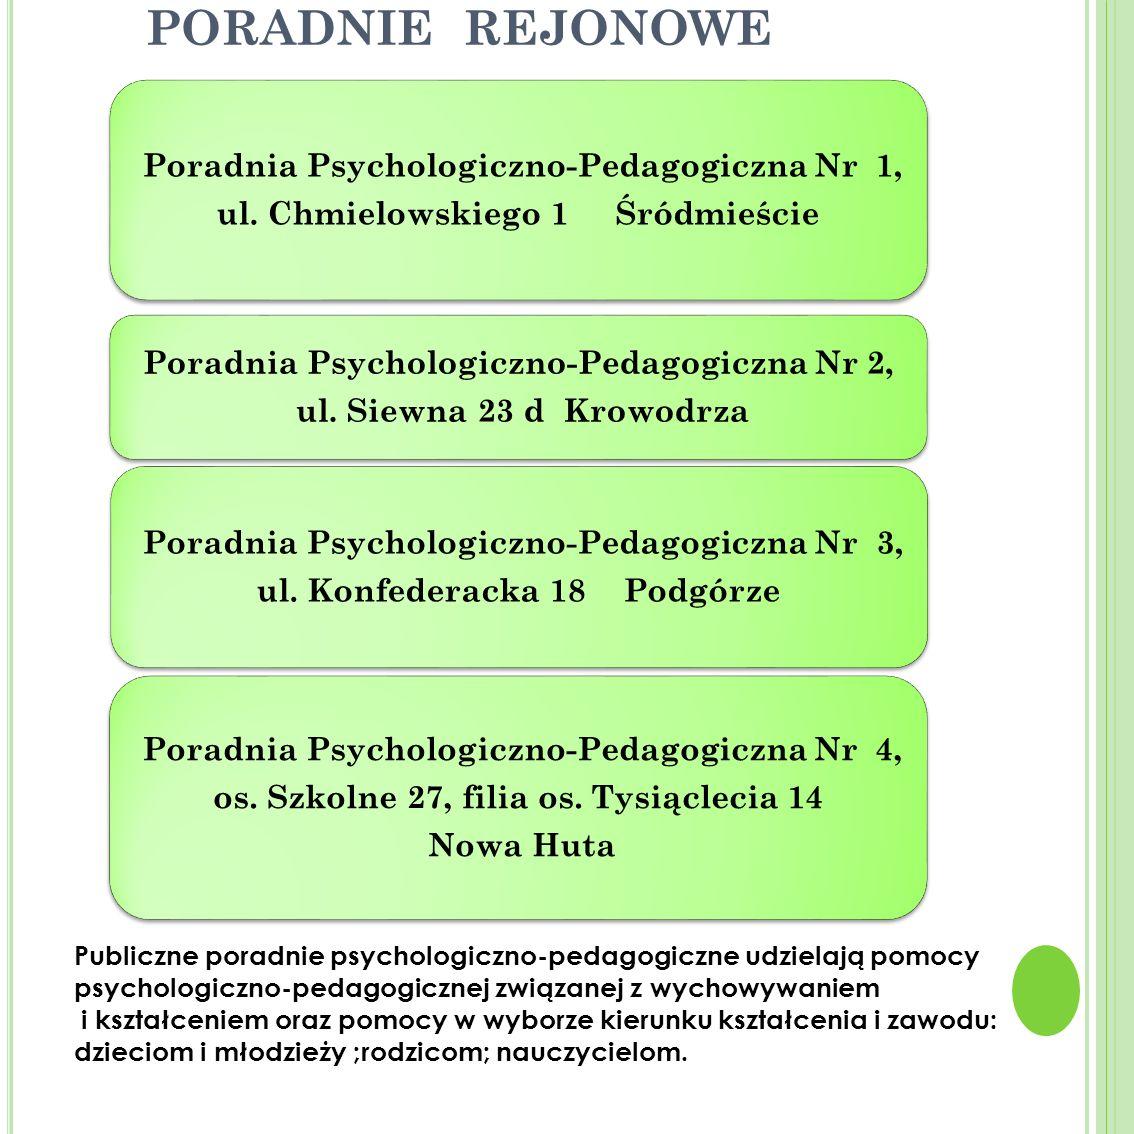 PORADNIE REJONOWE Poradnia Psychologiczno-Pedagogiczna Nr 1,